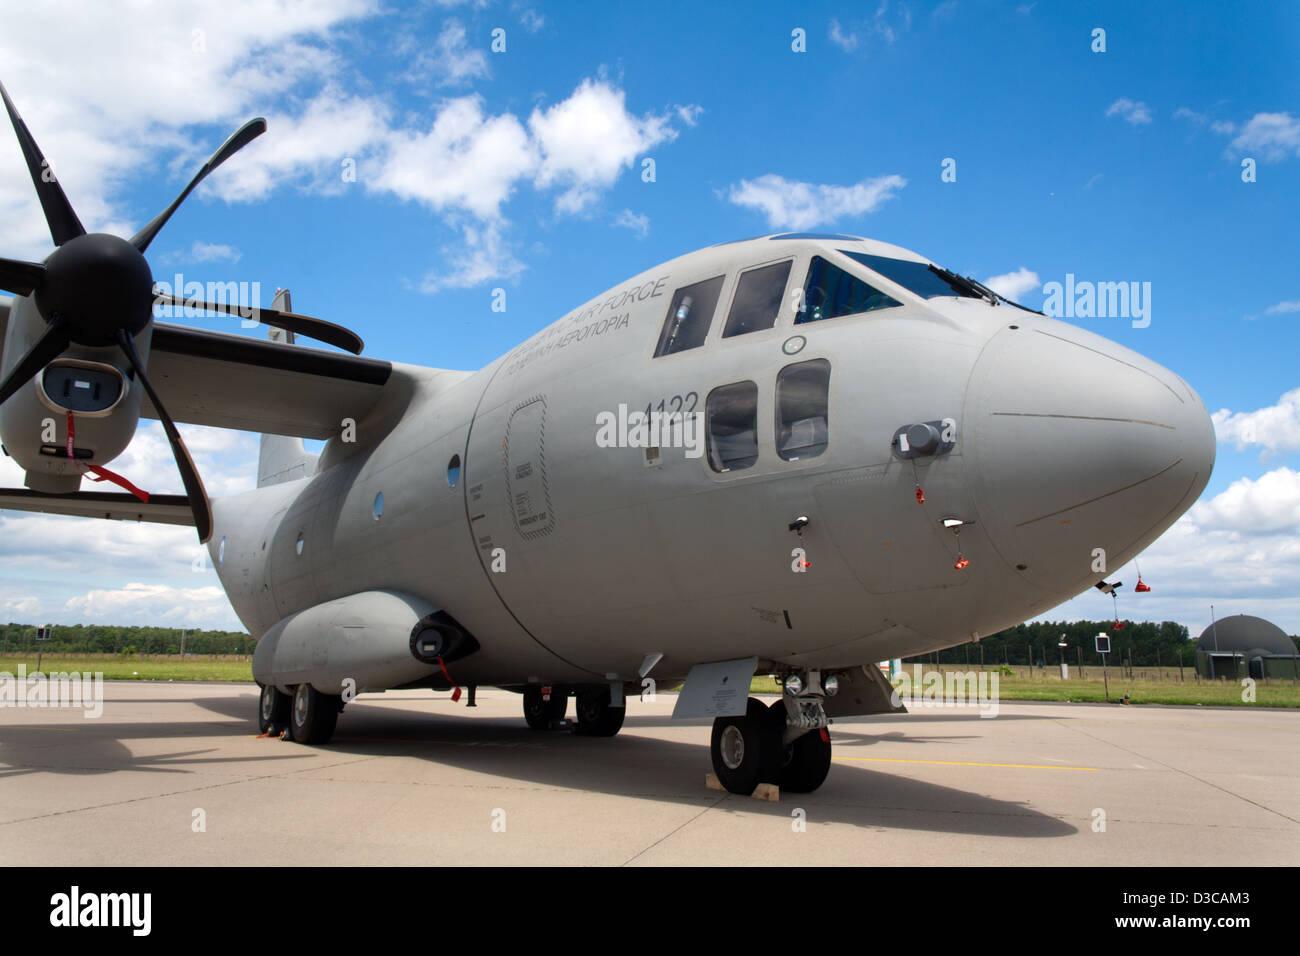 Hellenic Air Force Alenia C 27J Spartan transport plane